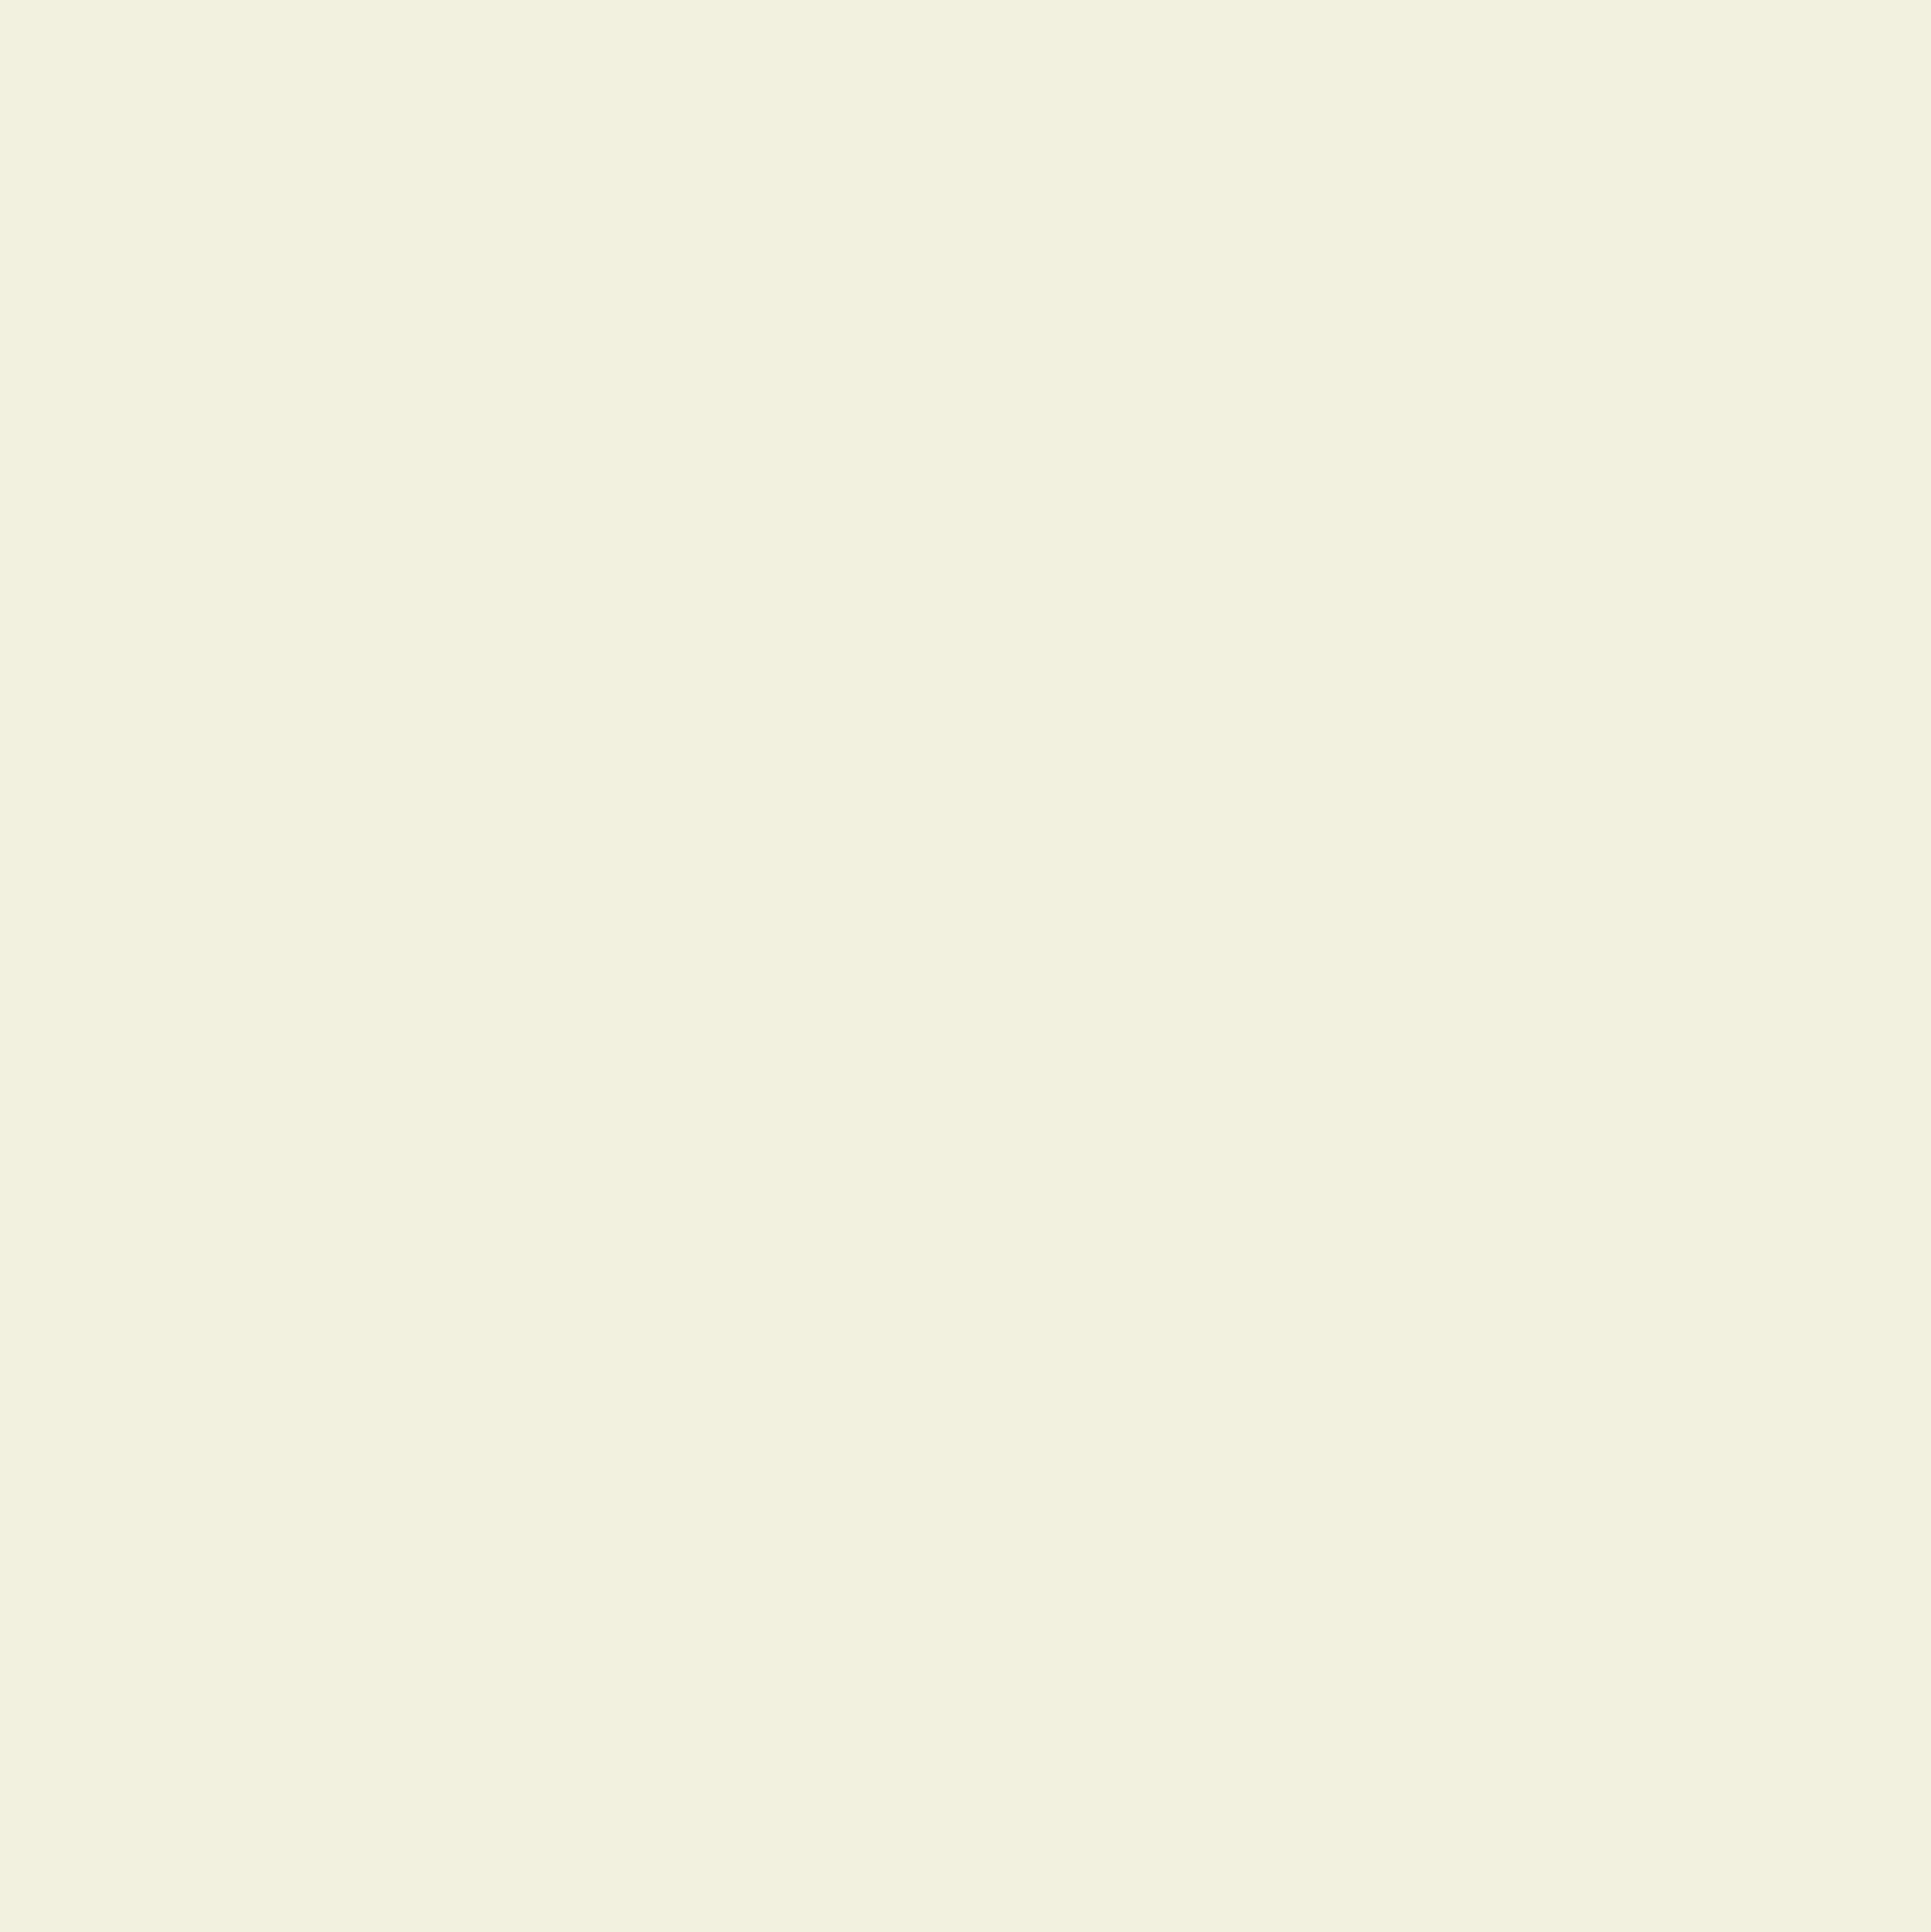 Mantel CRUDOColorLiso Rectangular 1,2x1,7m [enstockpara envíooretiro]